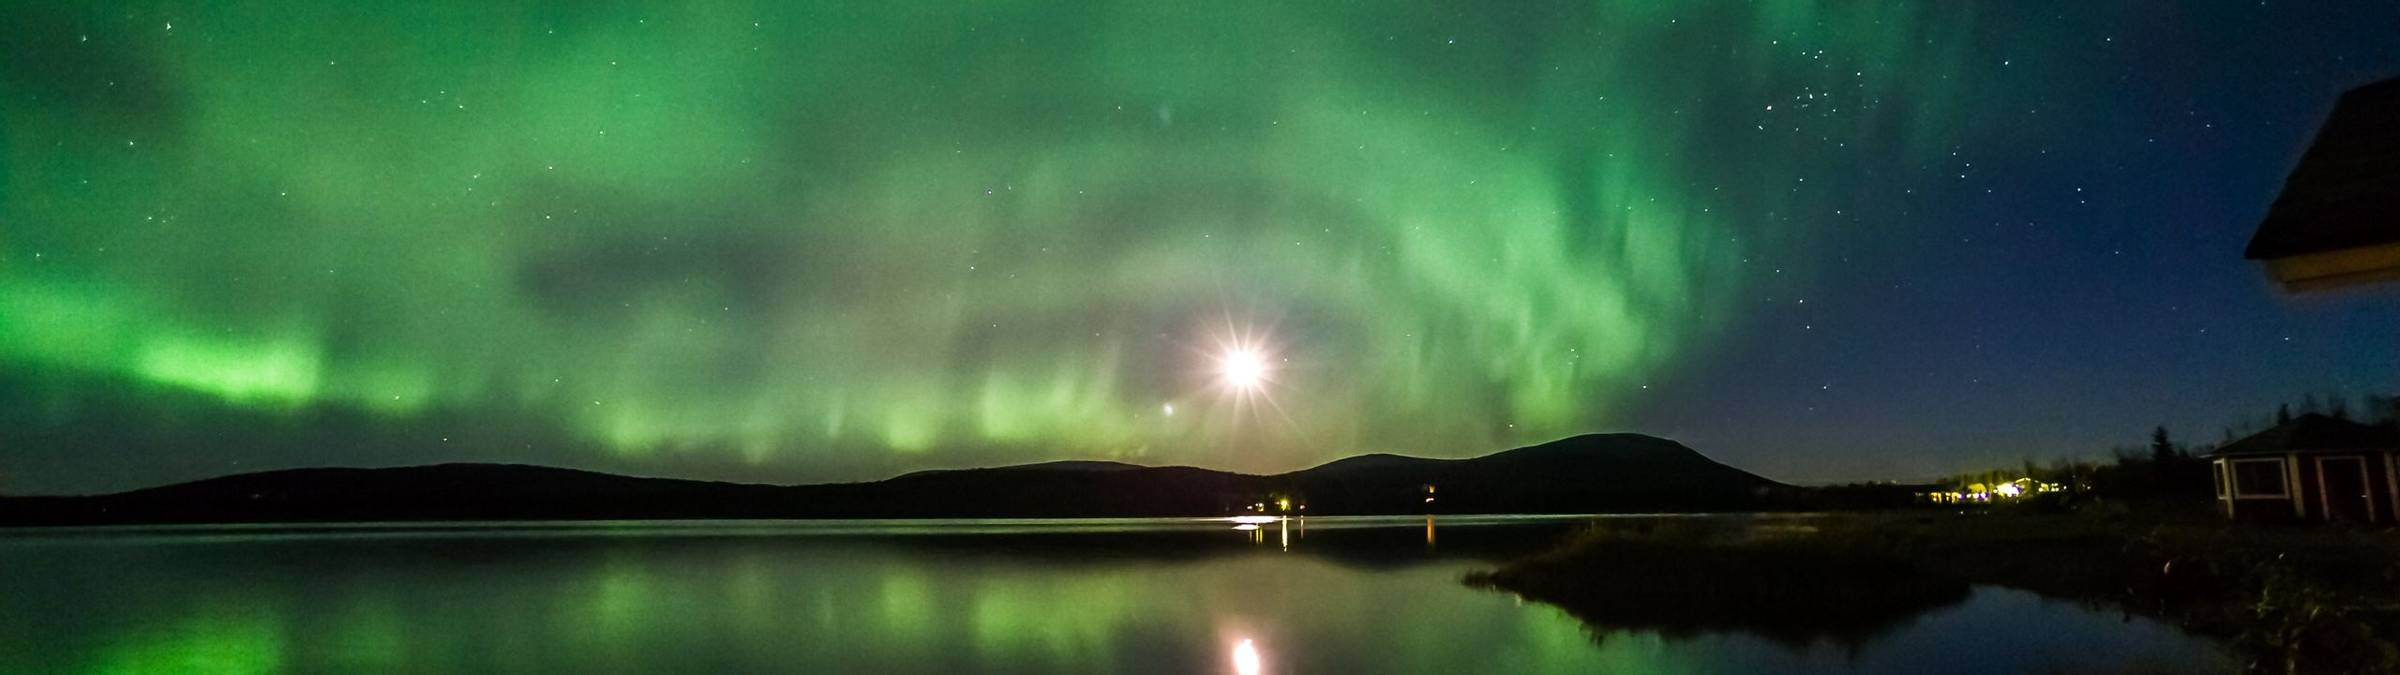 Autumn Northern Lights in Finnish Lapland - Credit Markus Kiili and Visit Finland.jpg